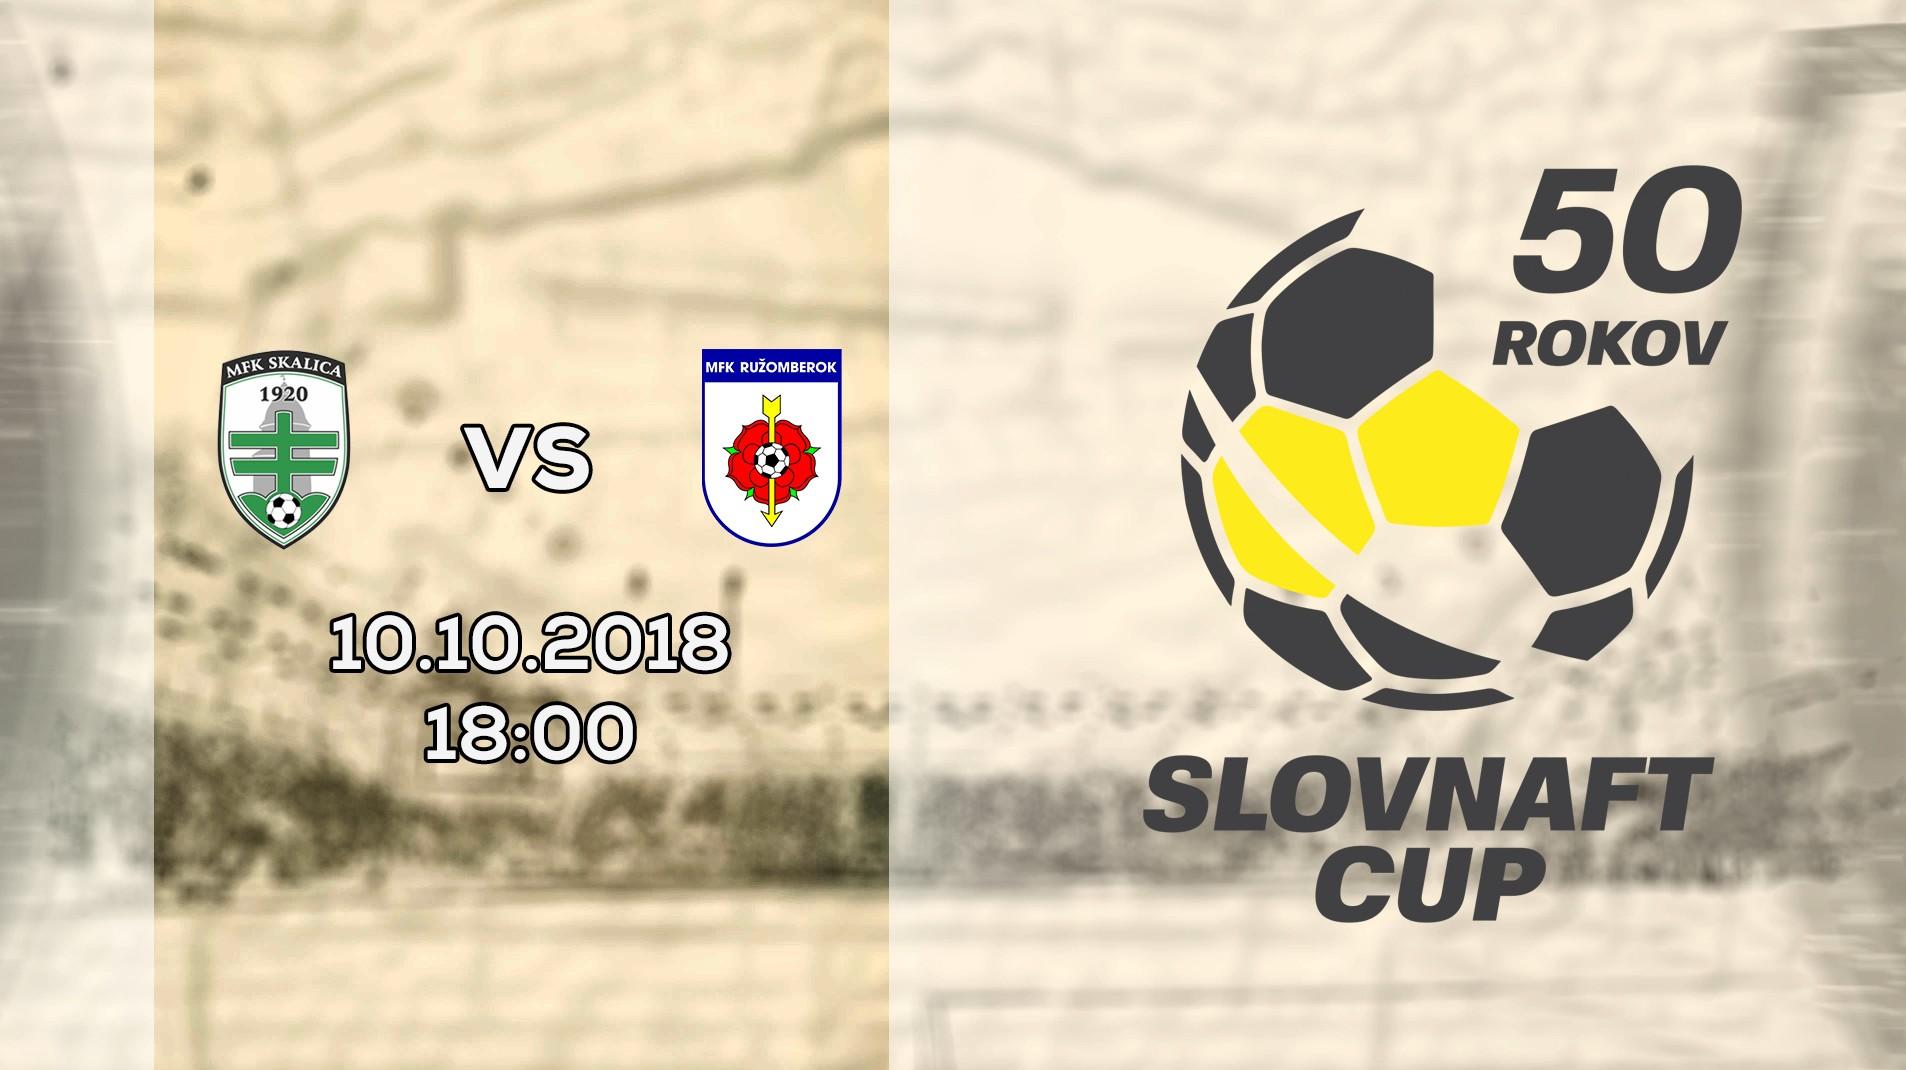 LIVE: SLOVNAFT CUP: 10. OKTÓBRA 2018, 18:00 MFK SKALICA – MFK RUŽOMBEROK